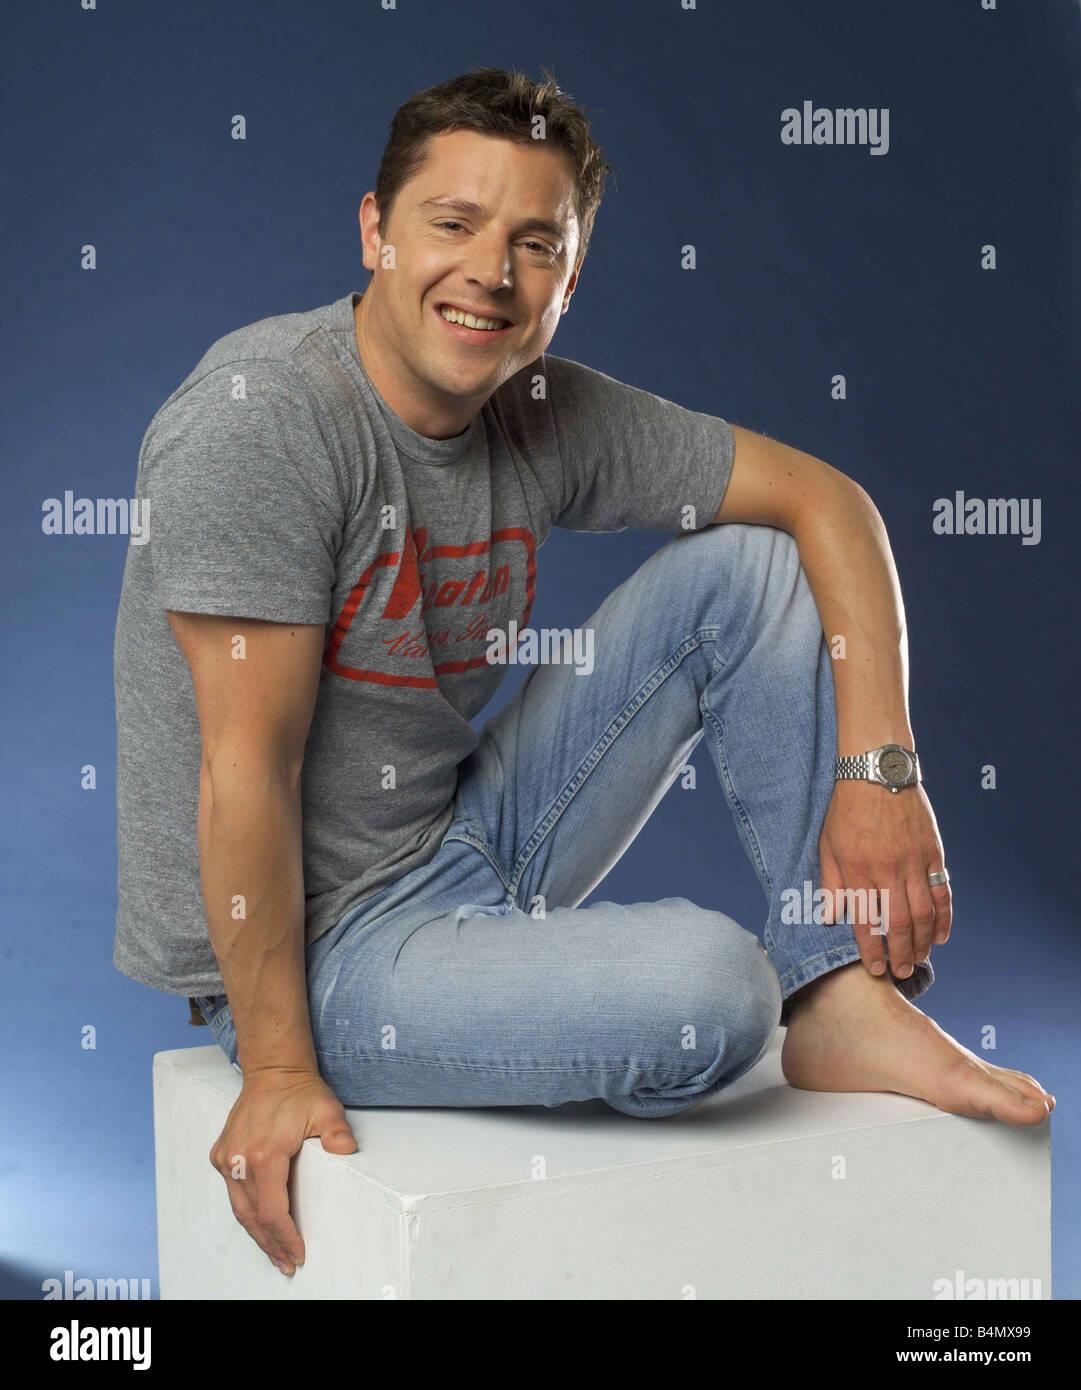 Gordan Whistance June 2002 Changing Rooms TV Presenter - Stock Image